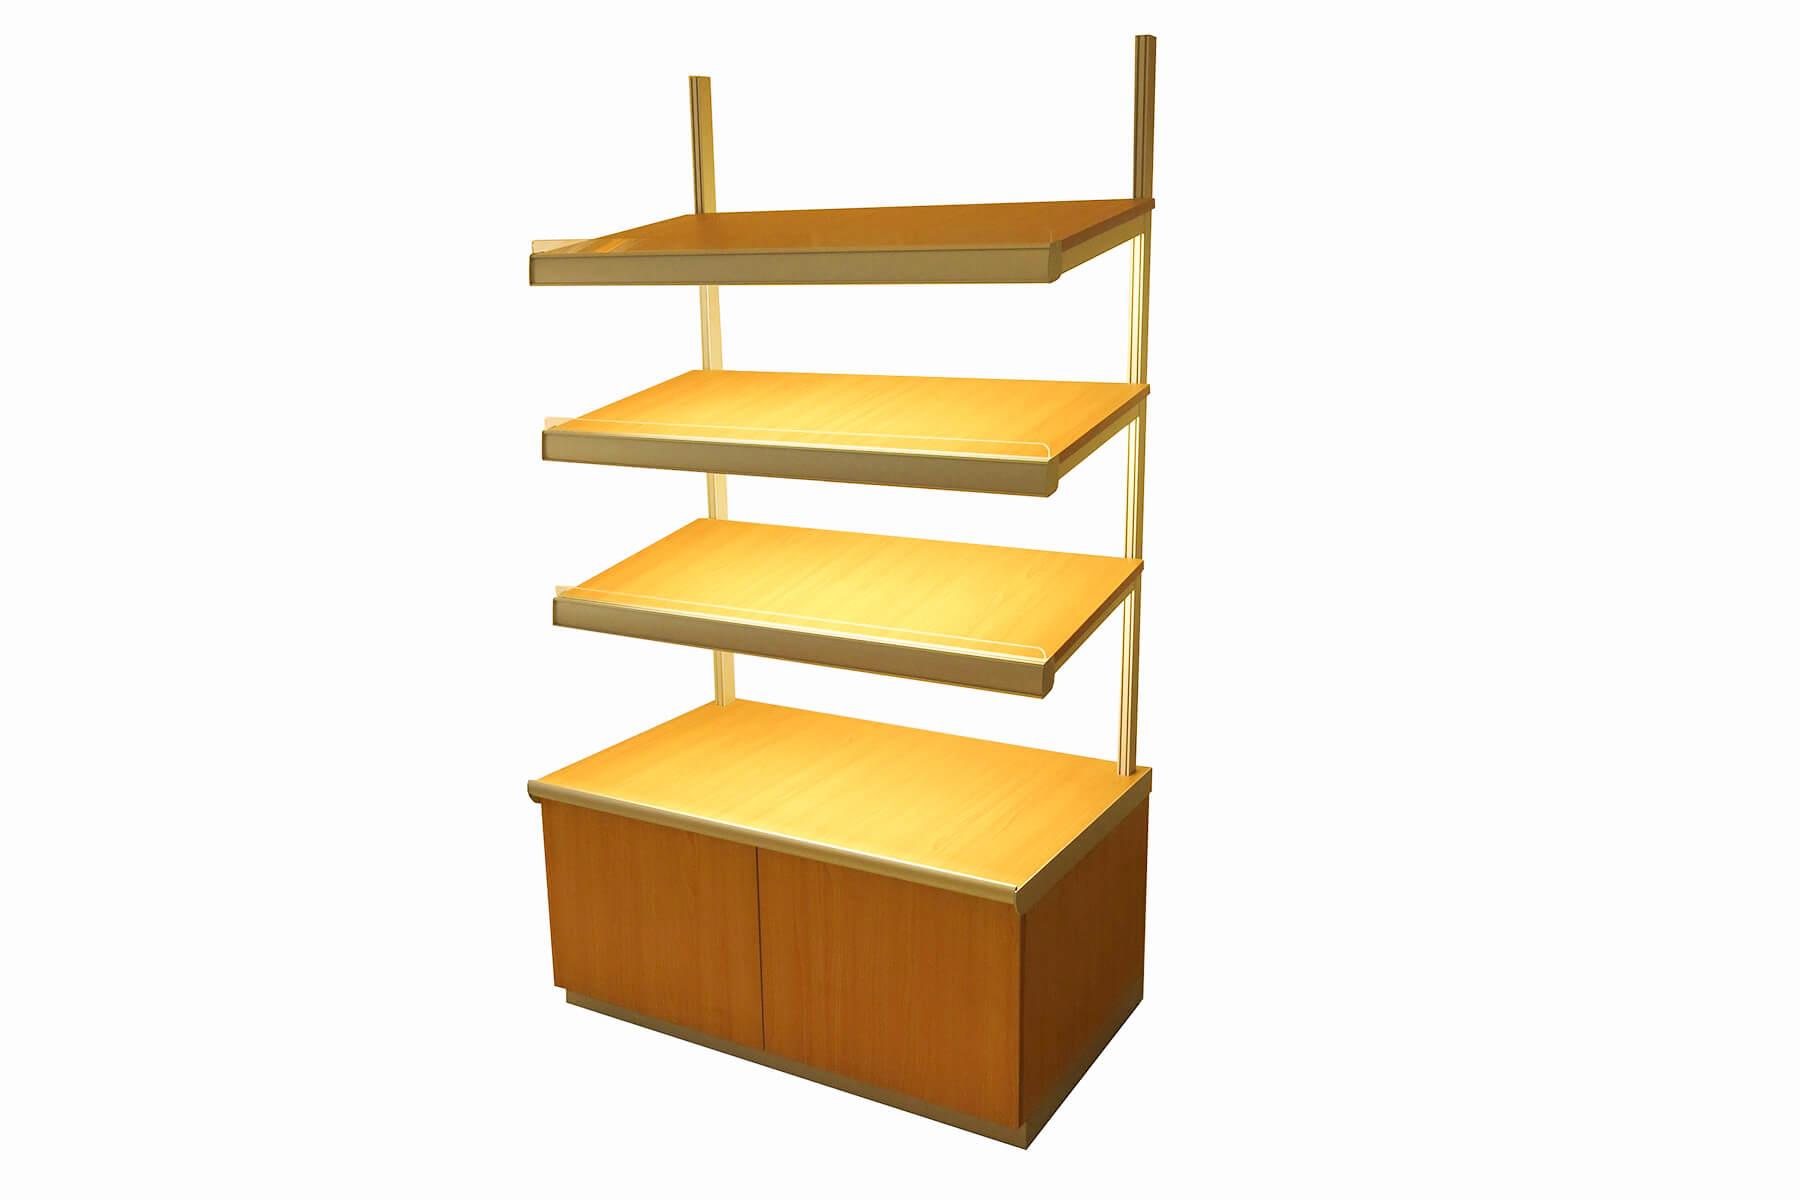 Optima T5 Shelves